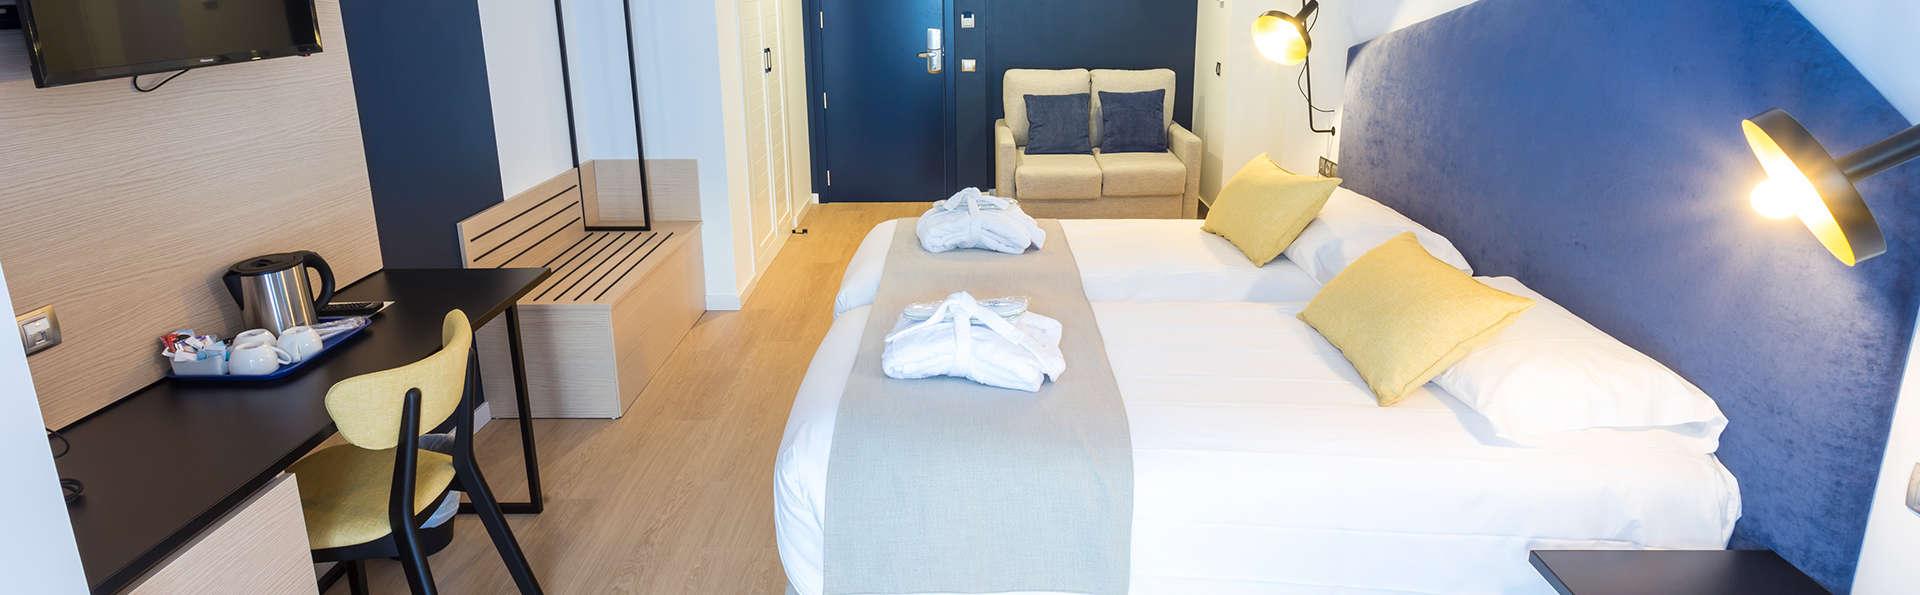 Hotel Roc Meler - Edit_TripleSuperior_-_copia.jpg